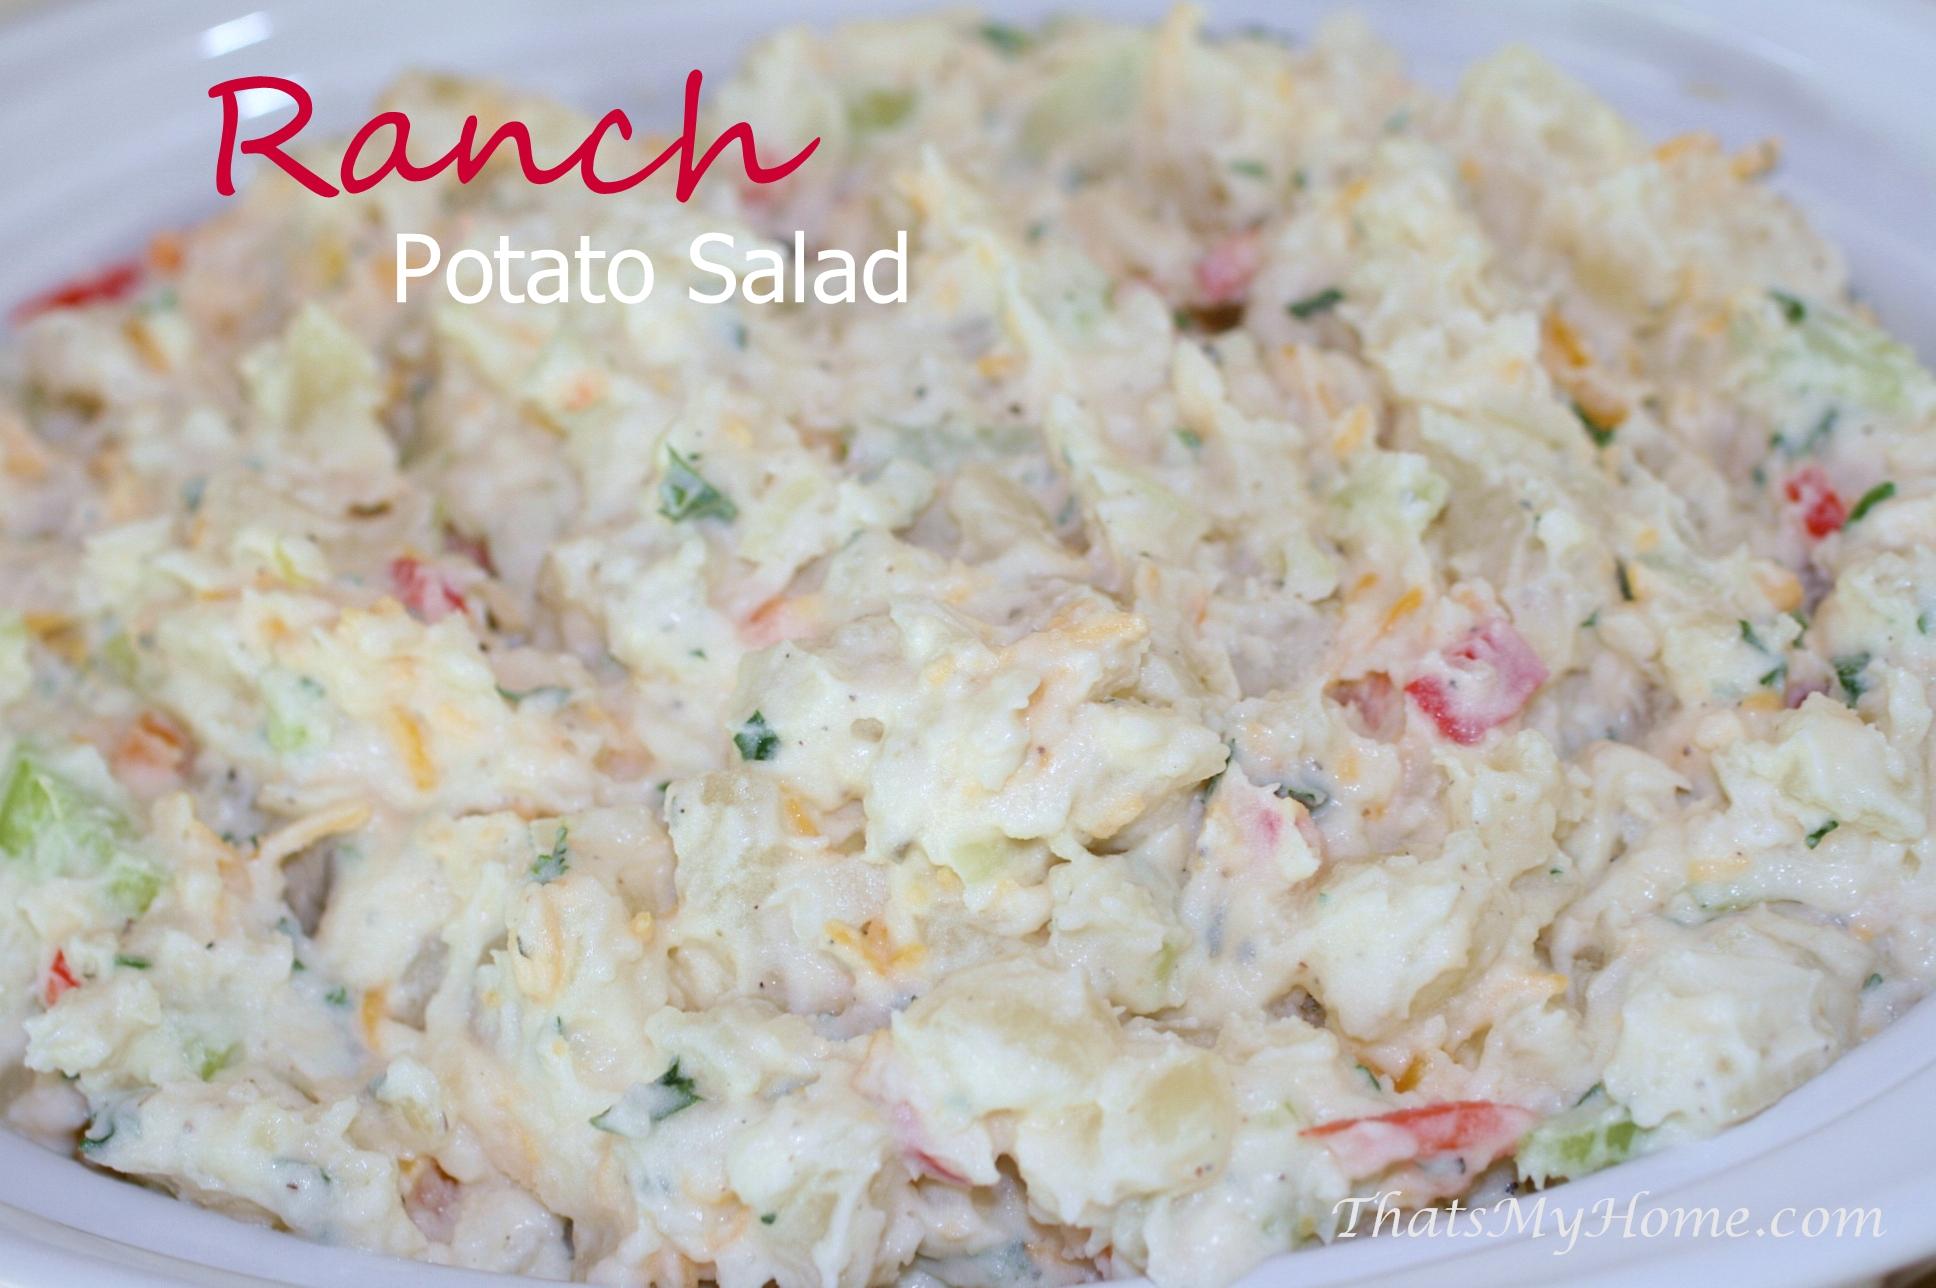 ranch-potato-salad-3